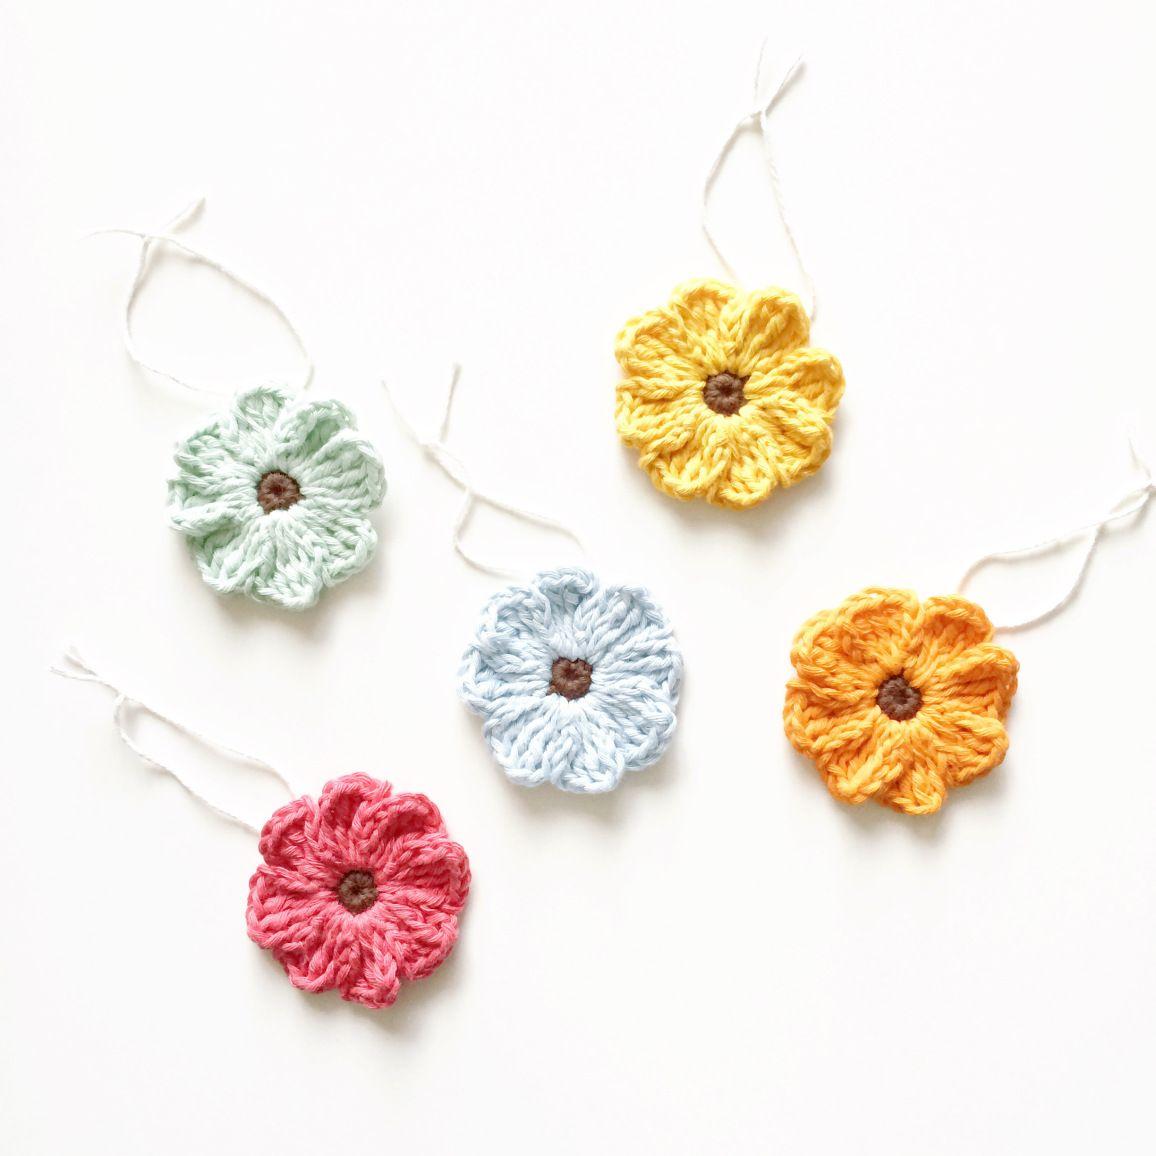 Pin de Lili López en crochet mini | Pinterest